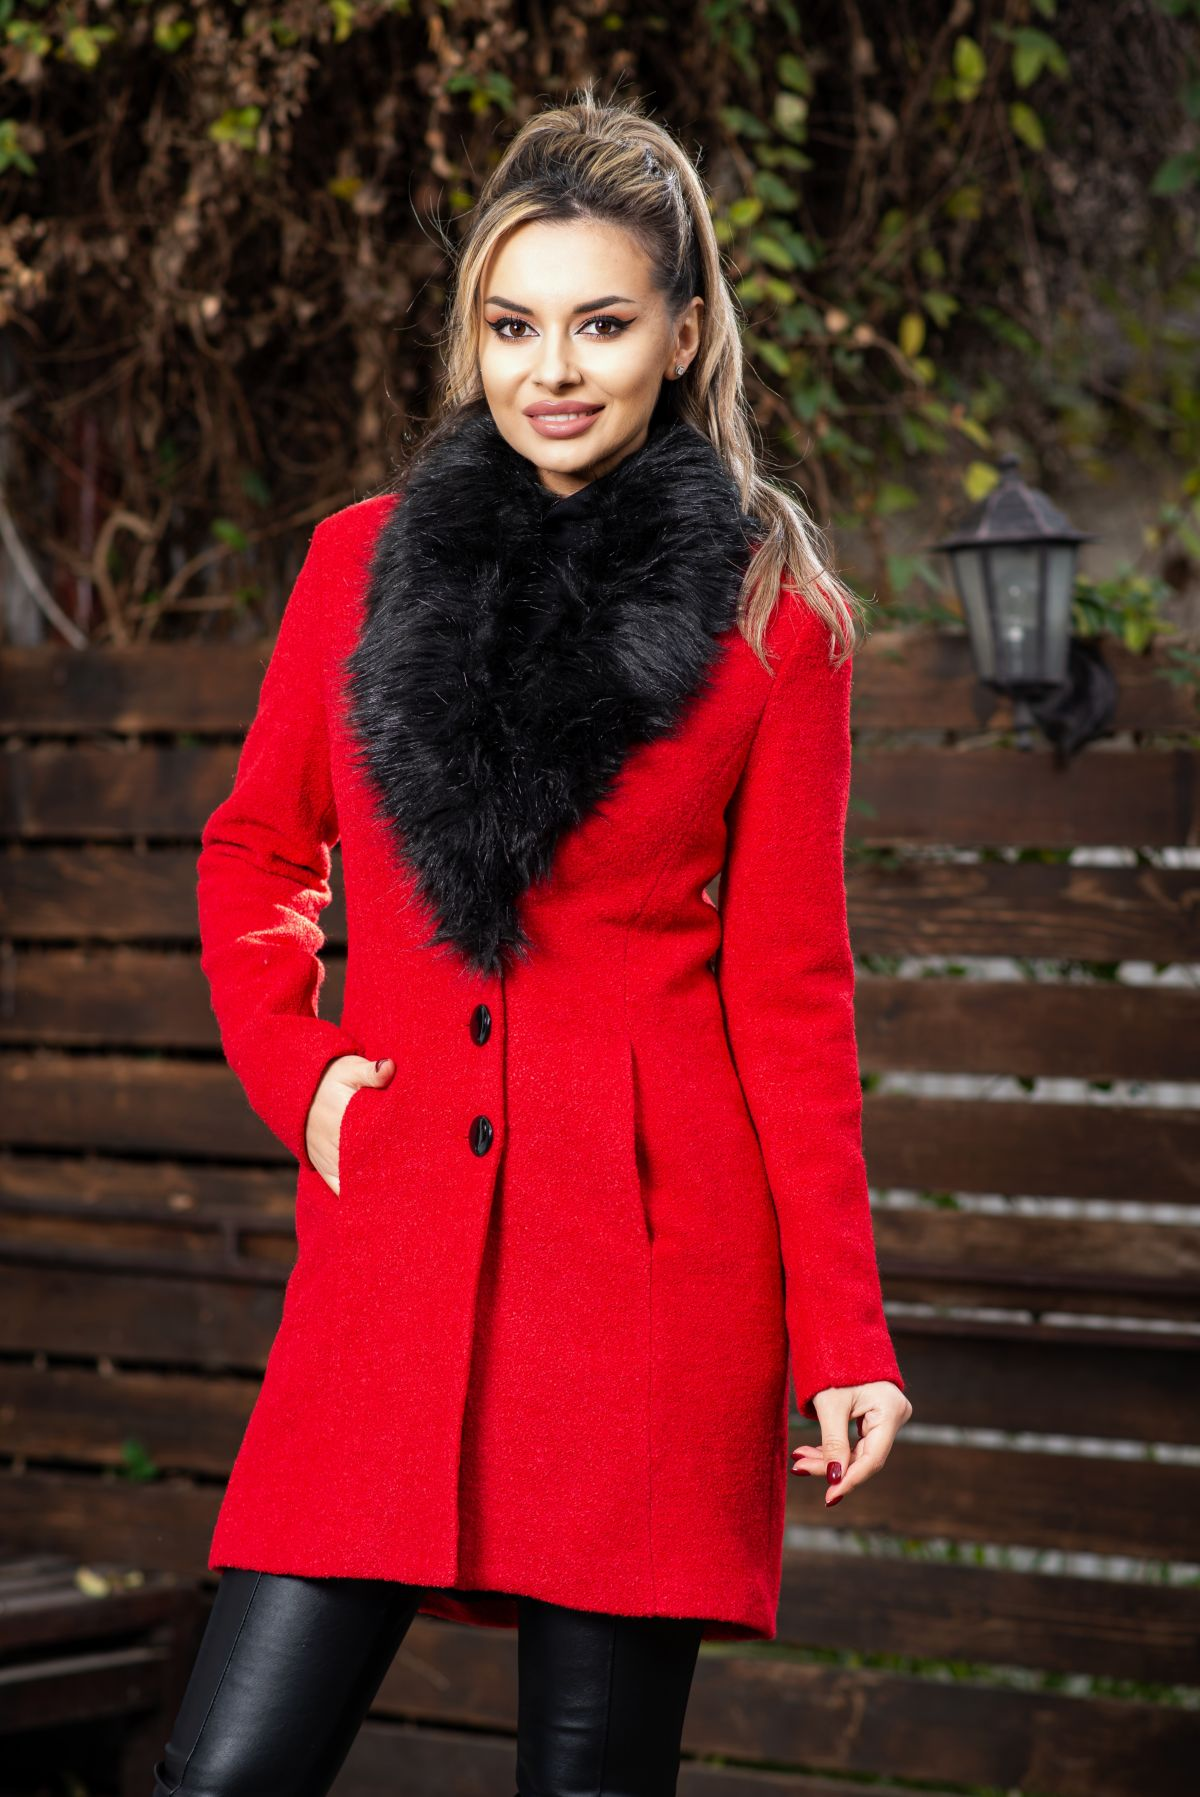 Palton elegant din stofa rosu matlasat cu blanita neagra